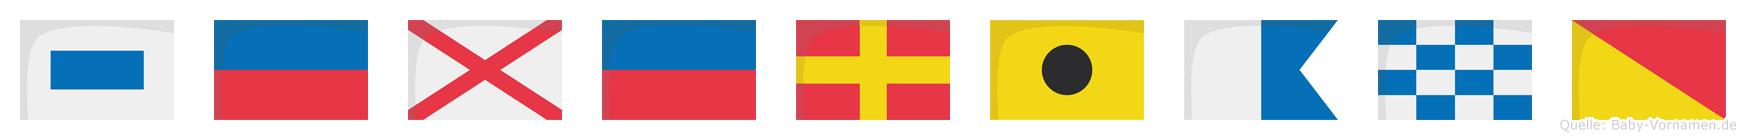 Severiano im Flaggenalphabet